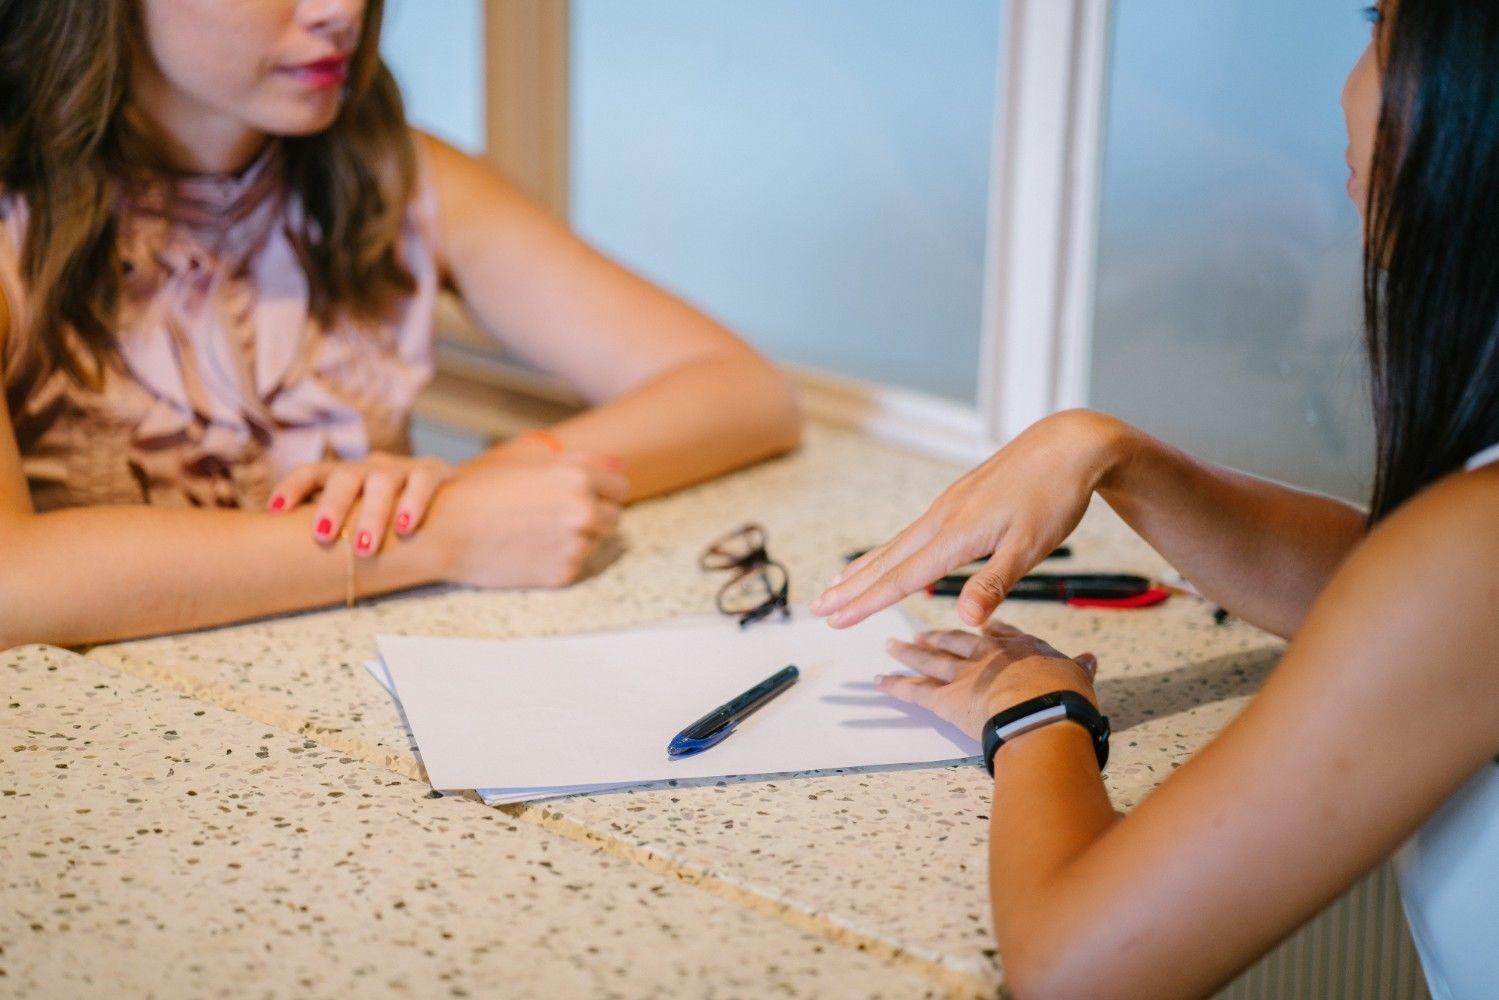 Tetap Profesional Meski Sedang Hadapi Perceraian